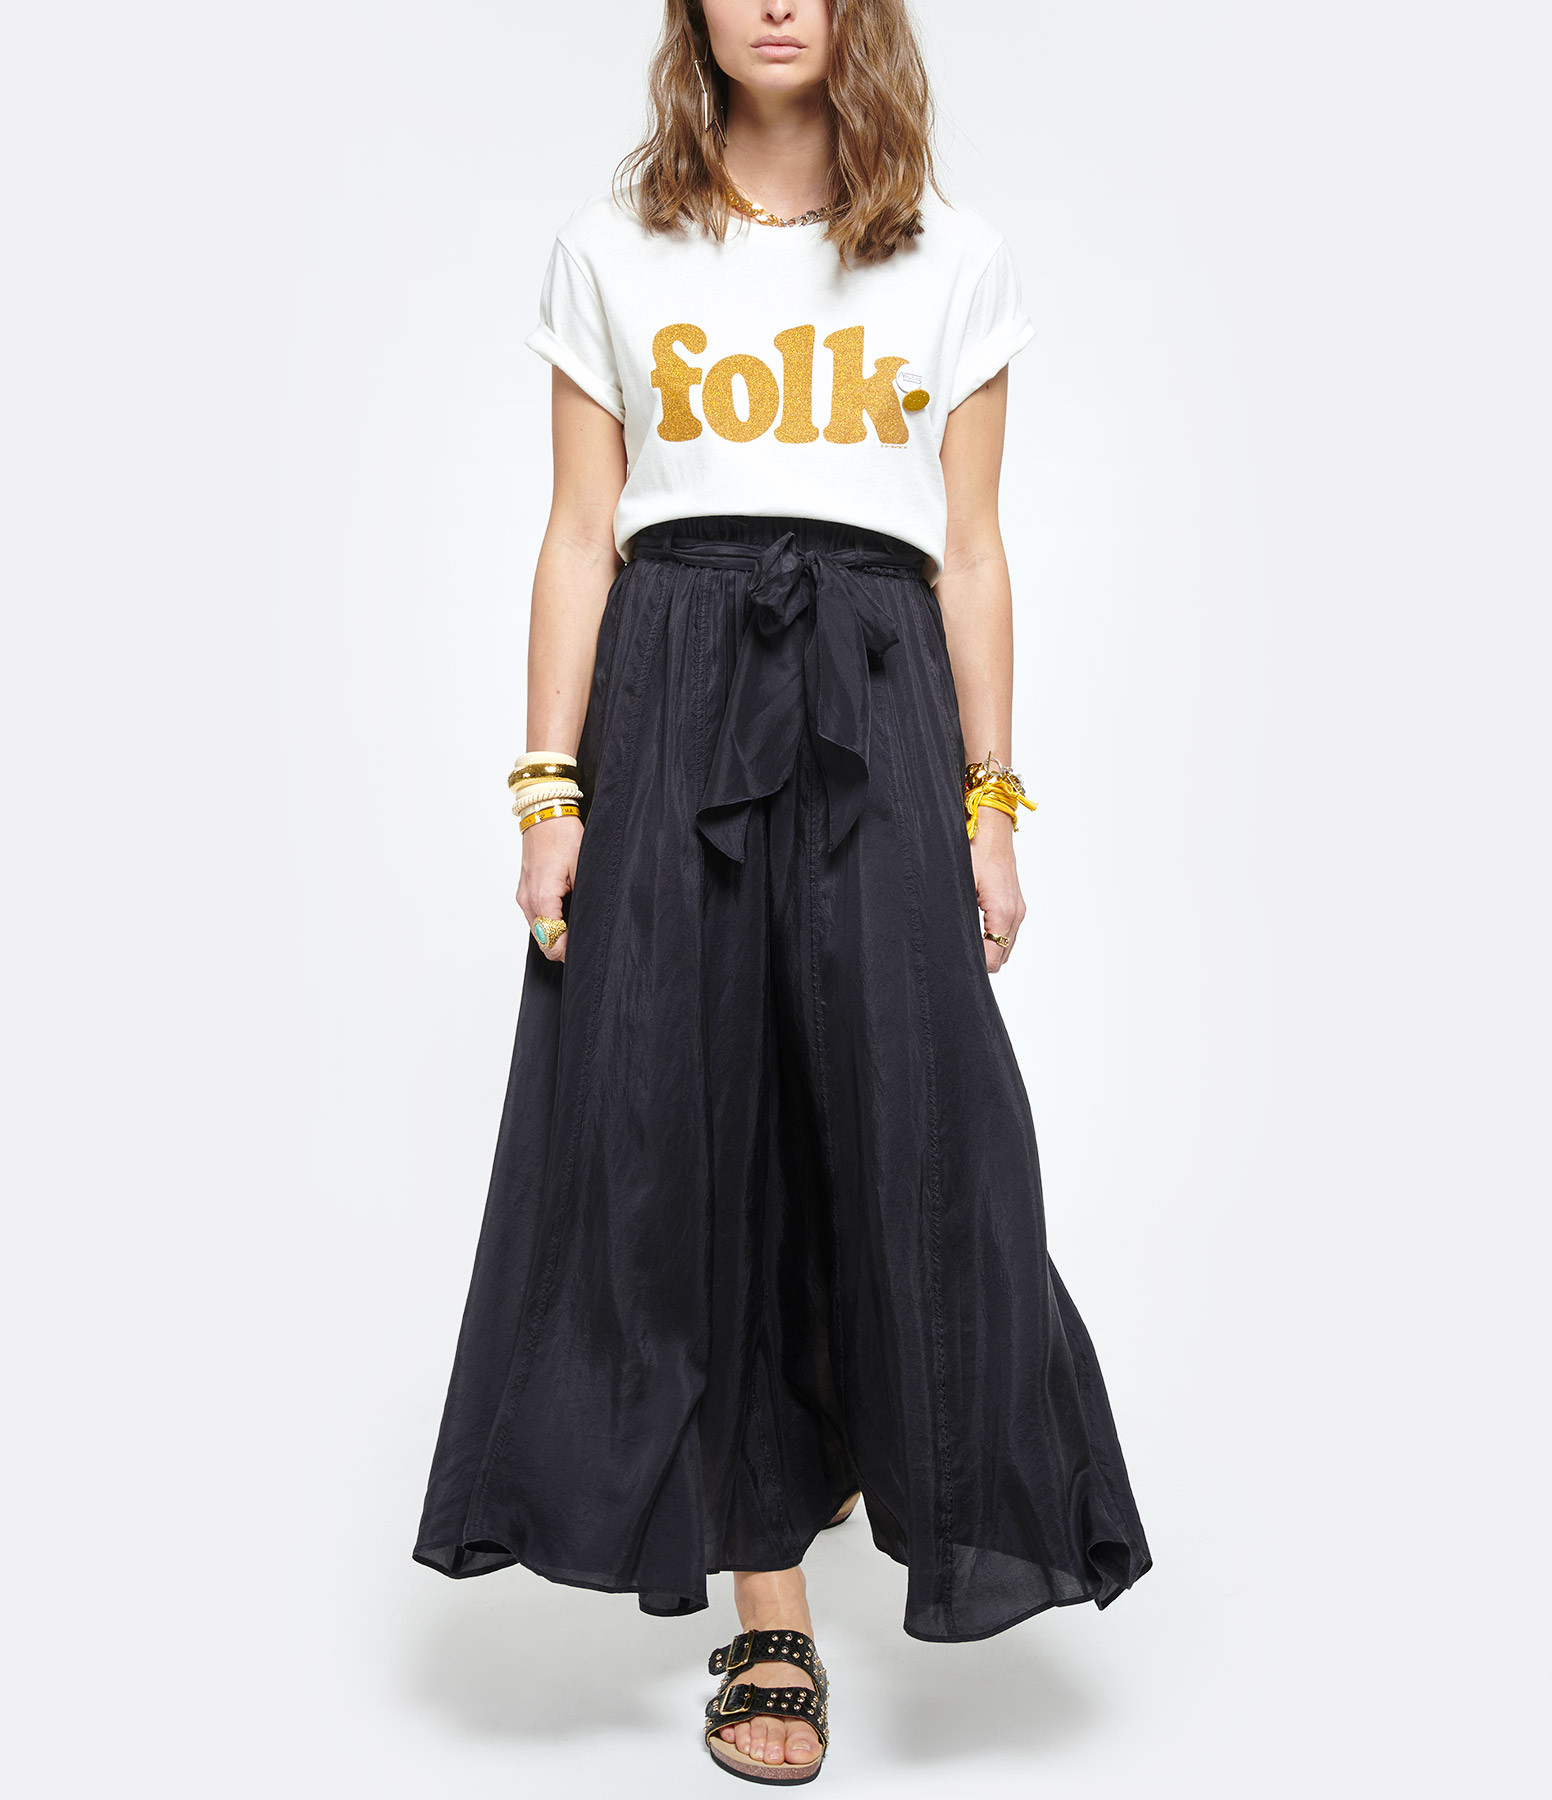 NEWTONE - Tee-shirt Starlight Folk Coton Écru